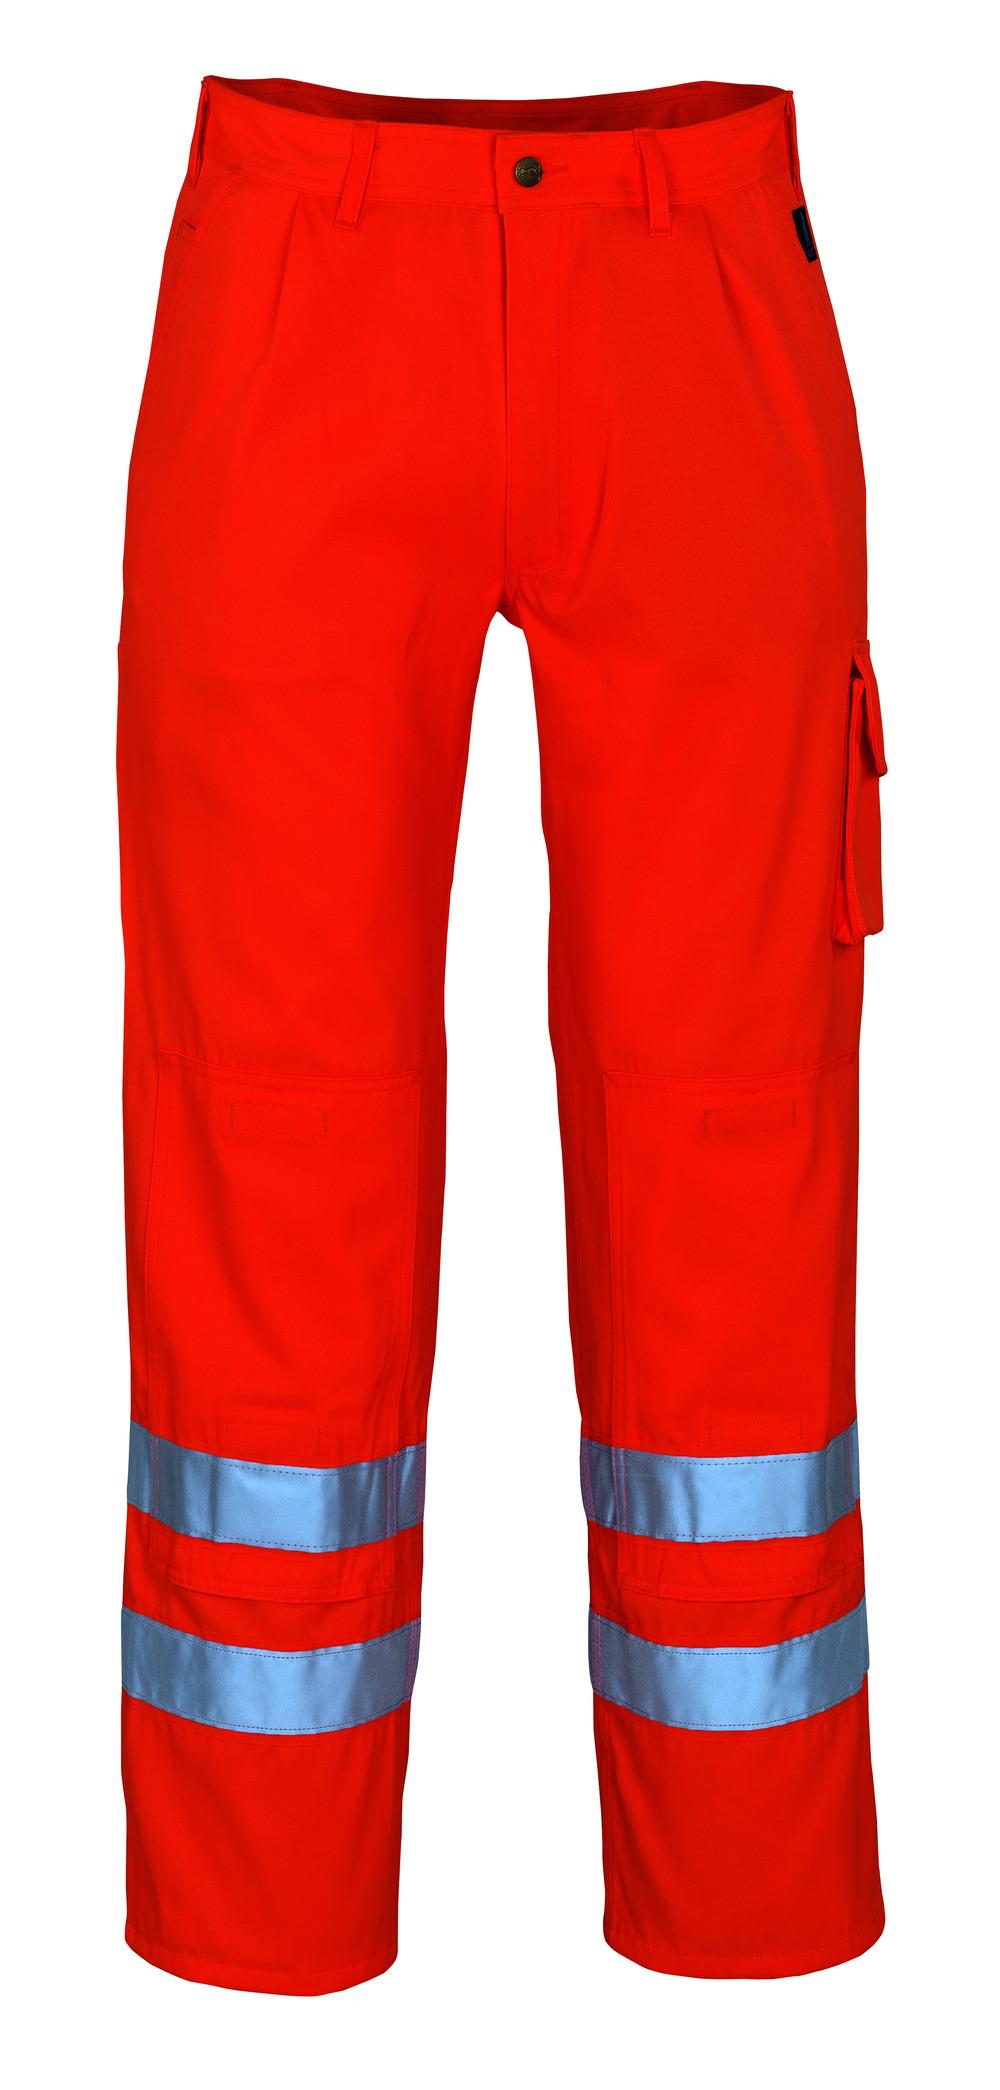 00479-860-14 Pantalones con bolsillos para rodilleras - naranja de alta vis.